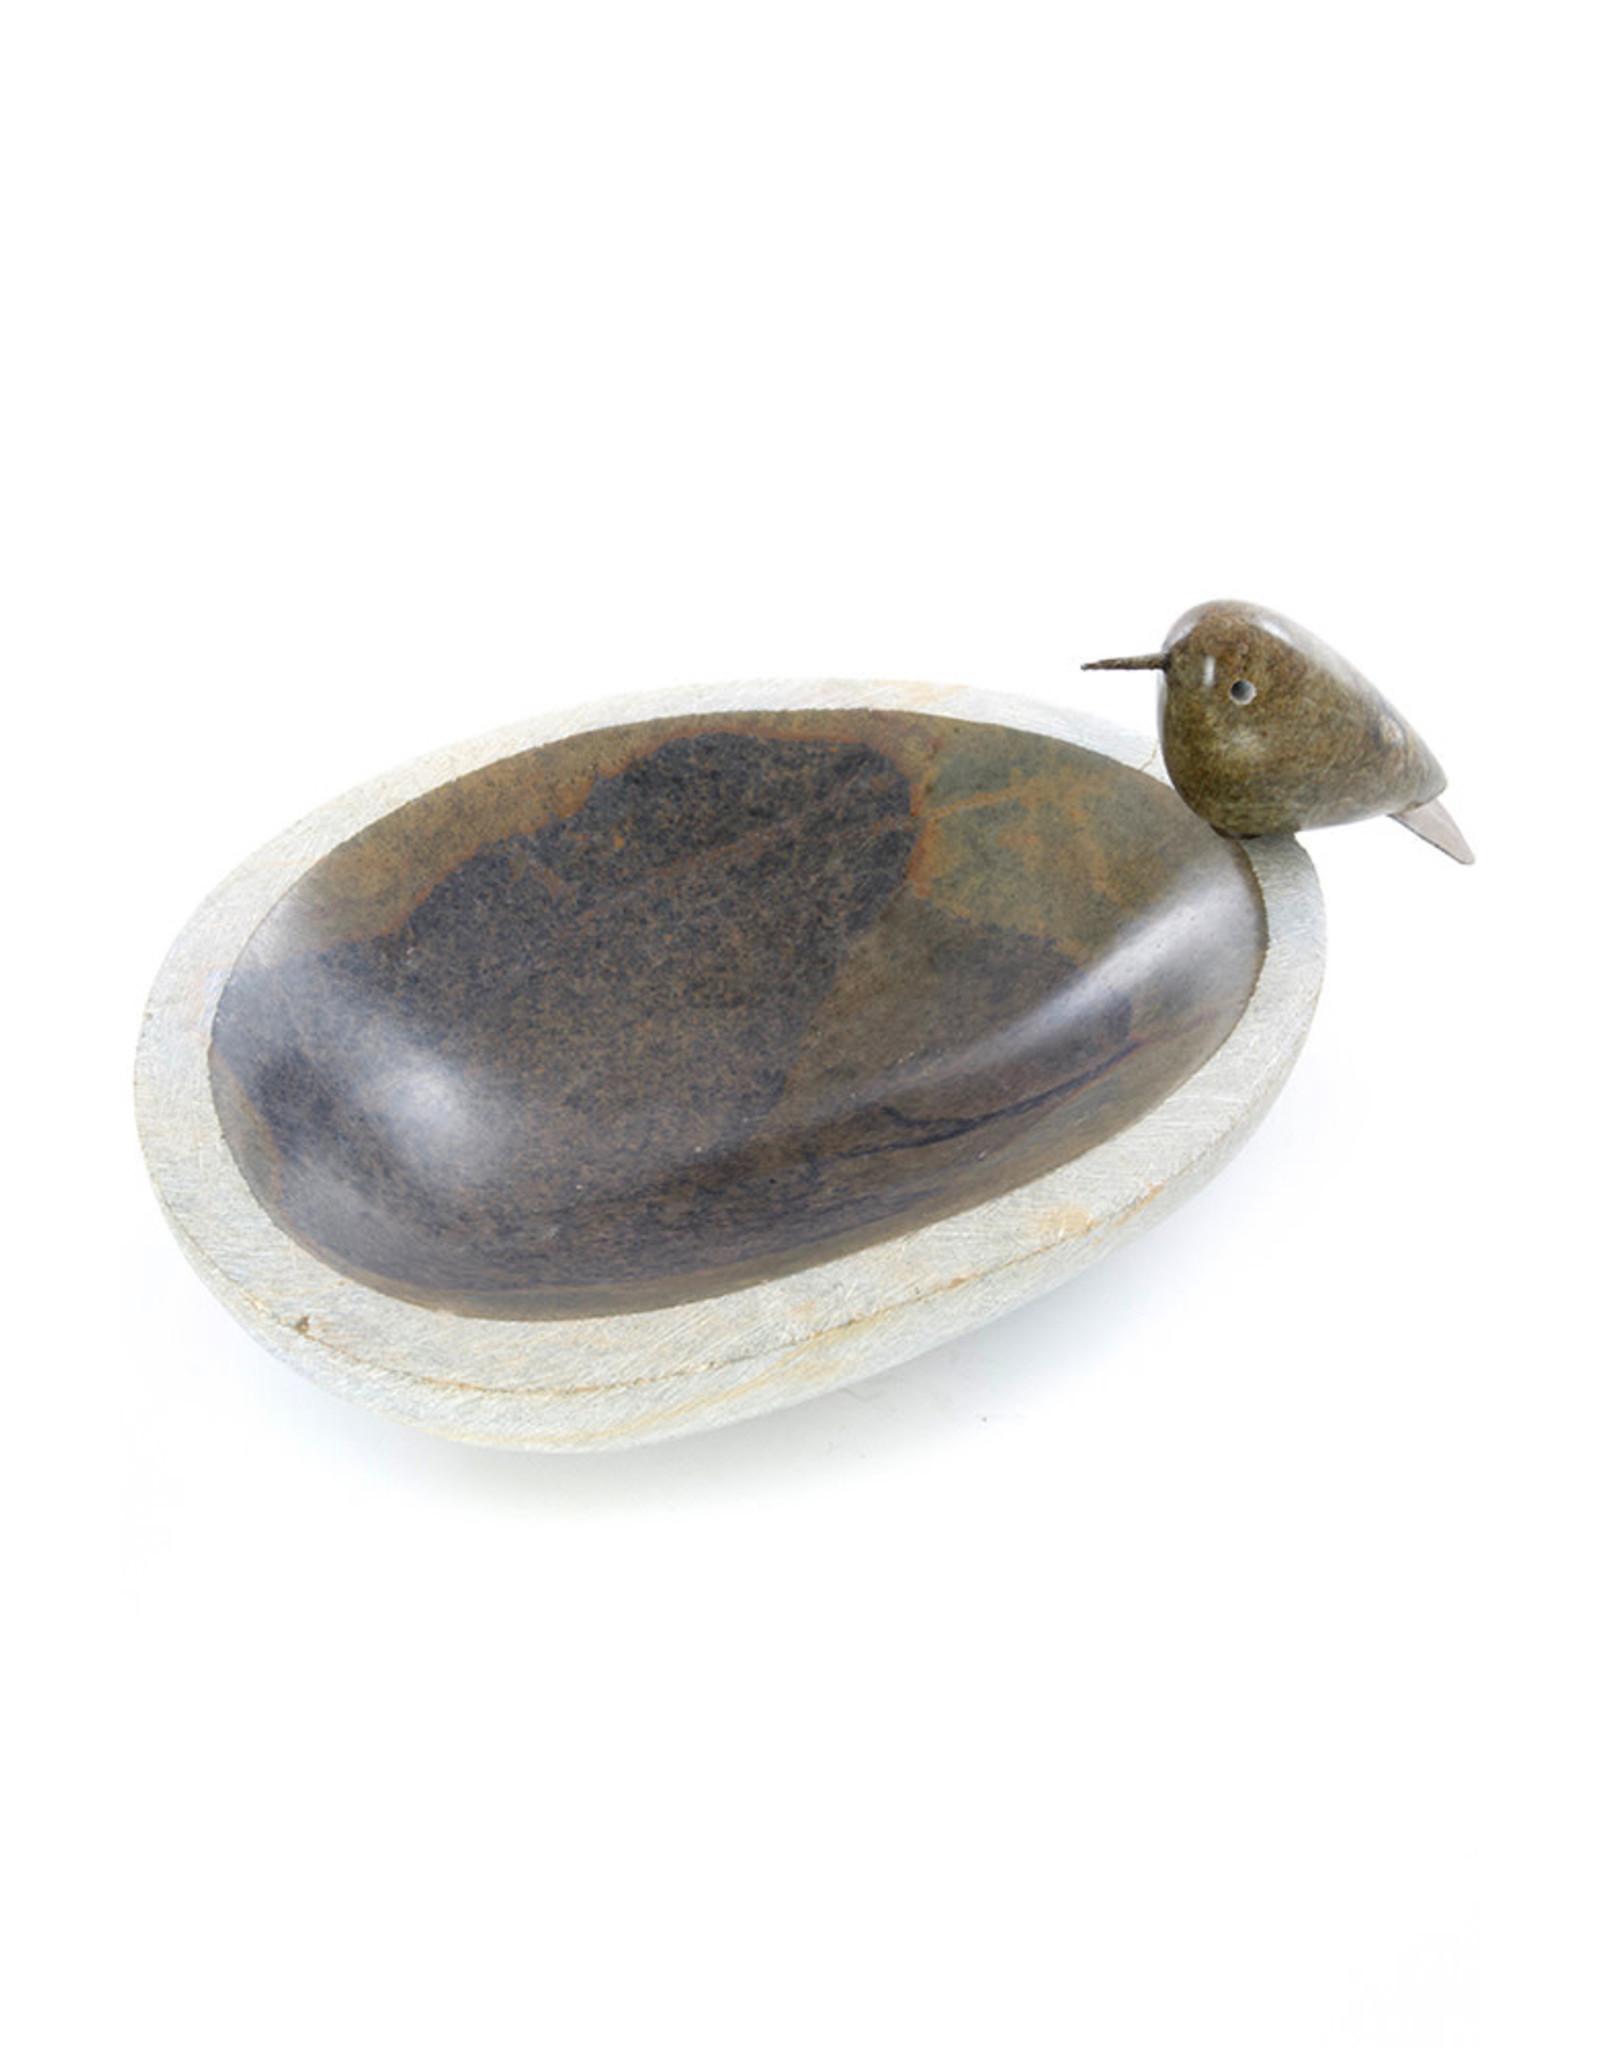 Swahili Wholesale Little Songbird Serpentine Birdbath, Zimbabwe